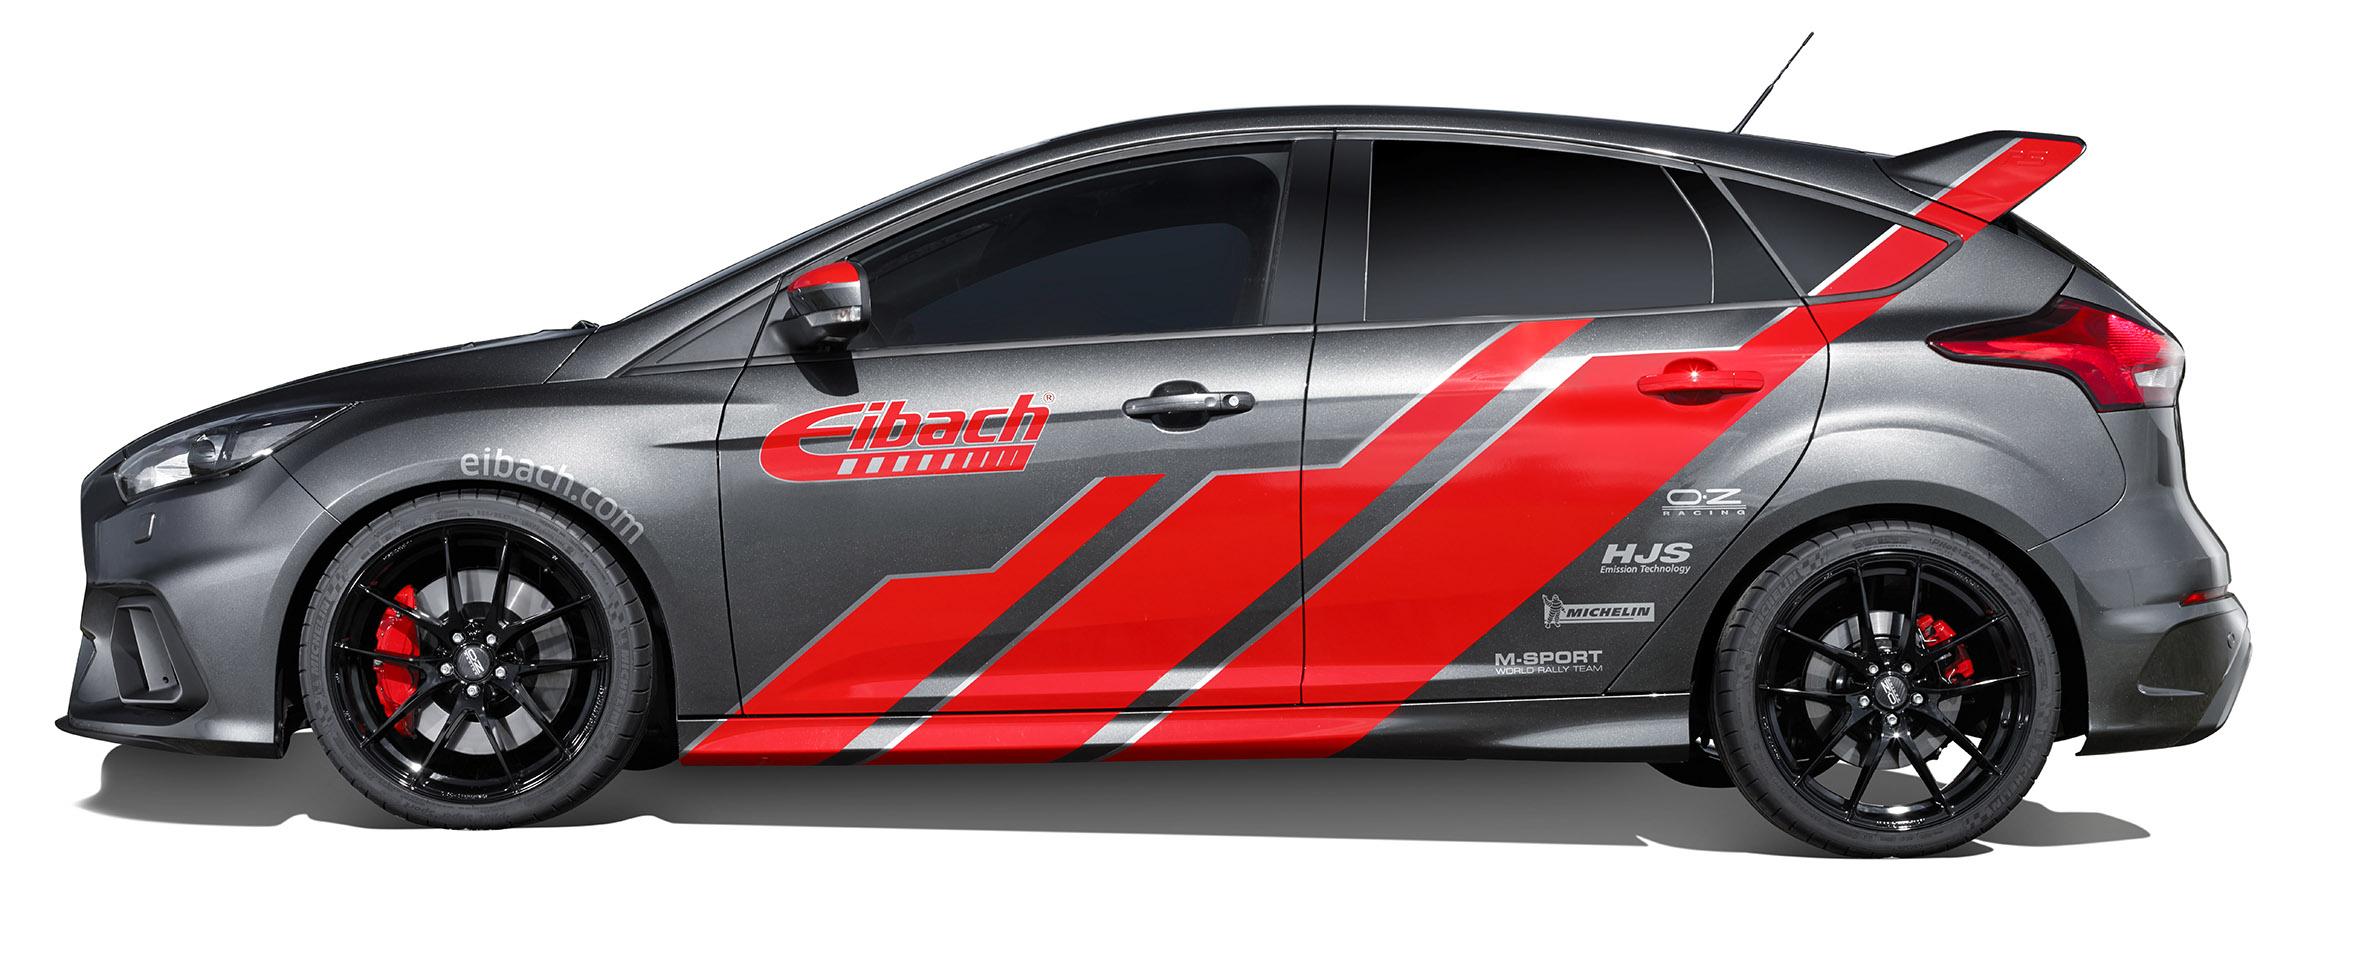 Kisselback Ford Used Cars Cars Image 2018